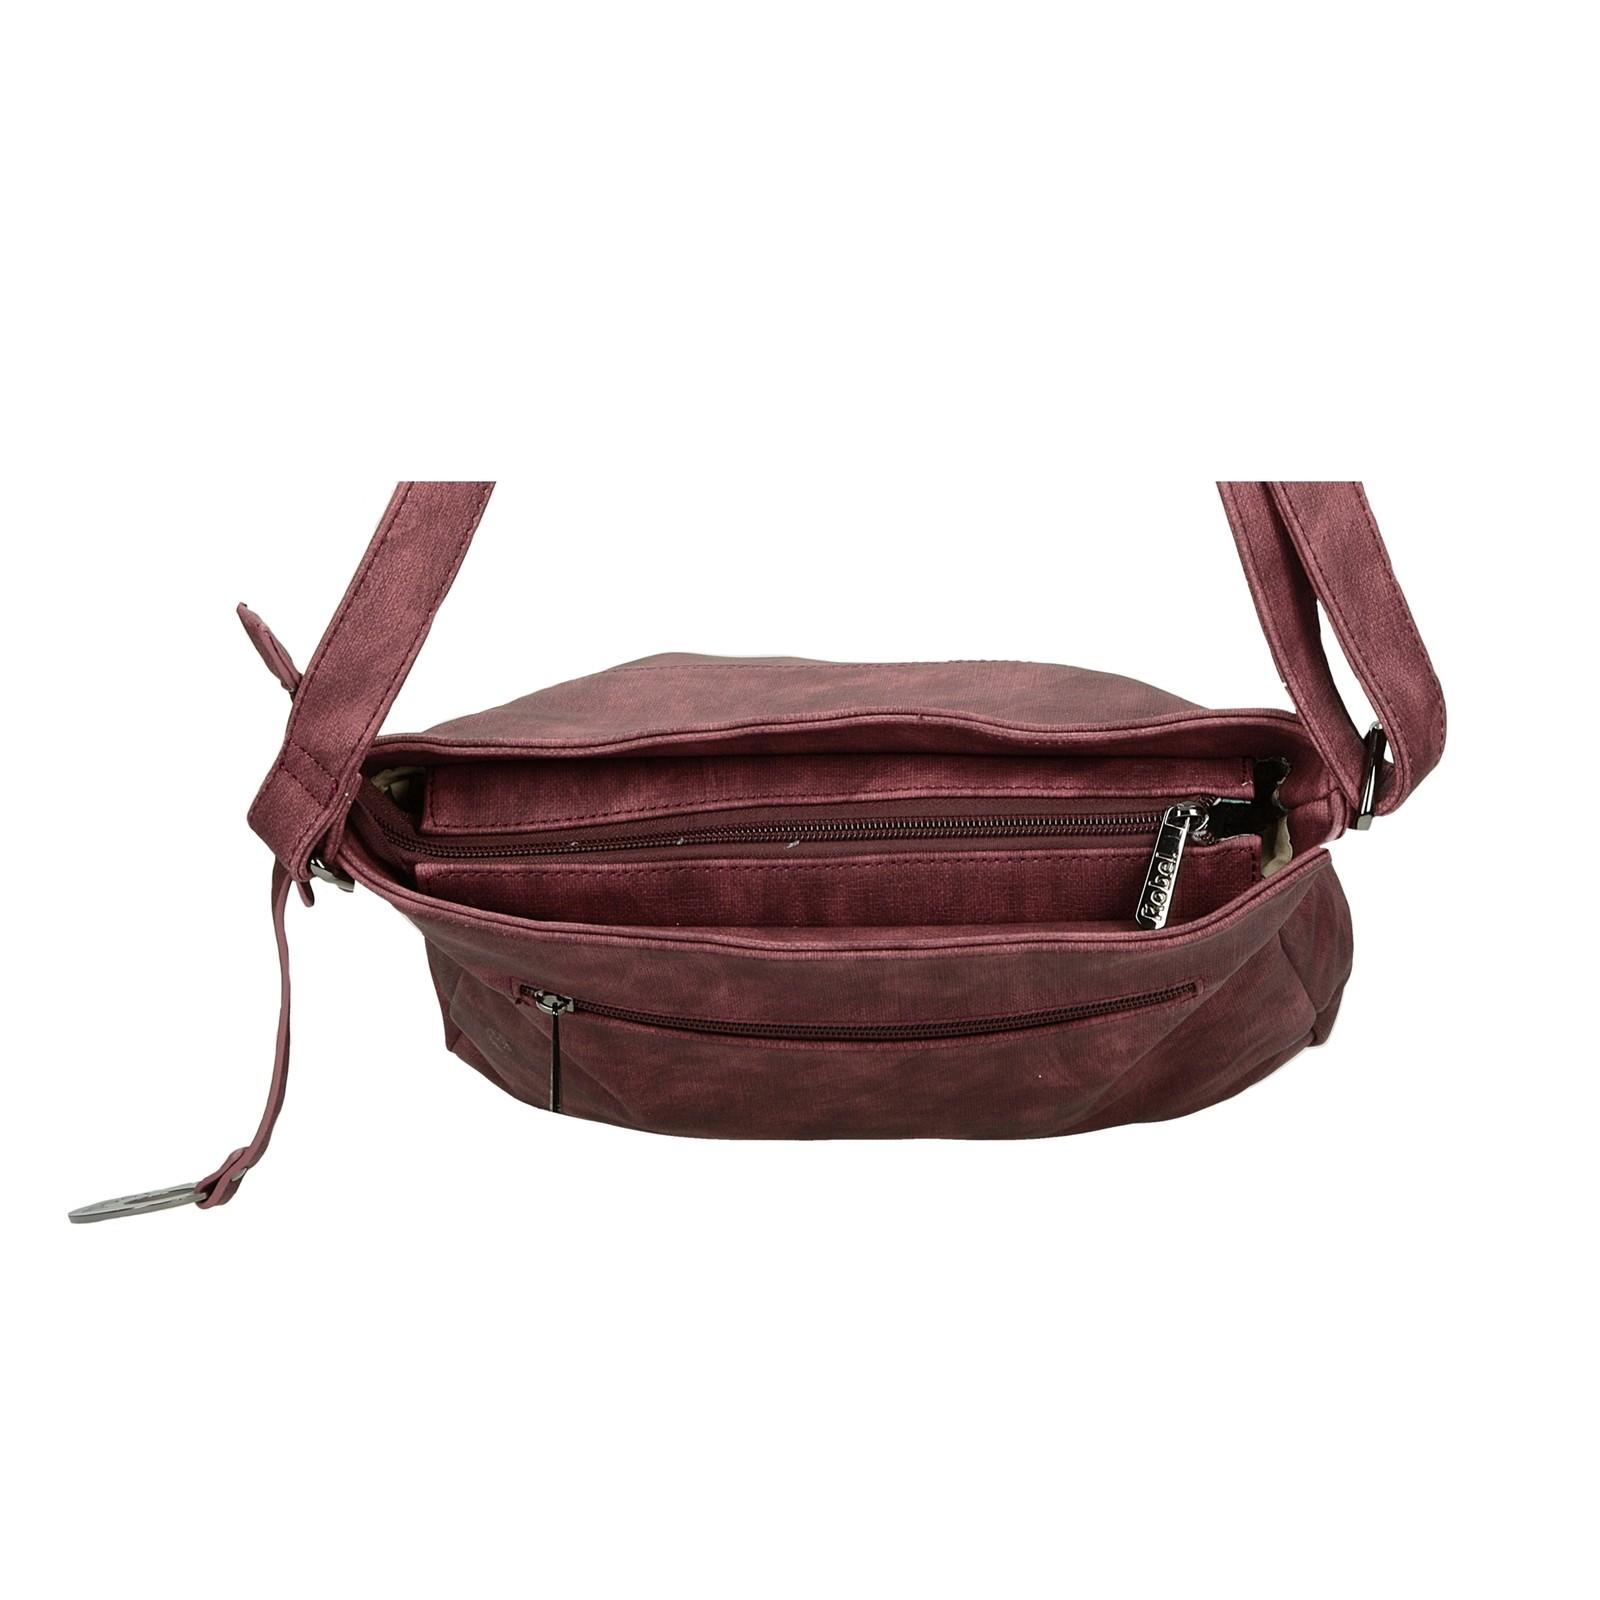 Robel dámská kabelka - bordó